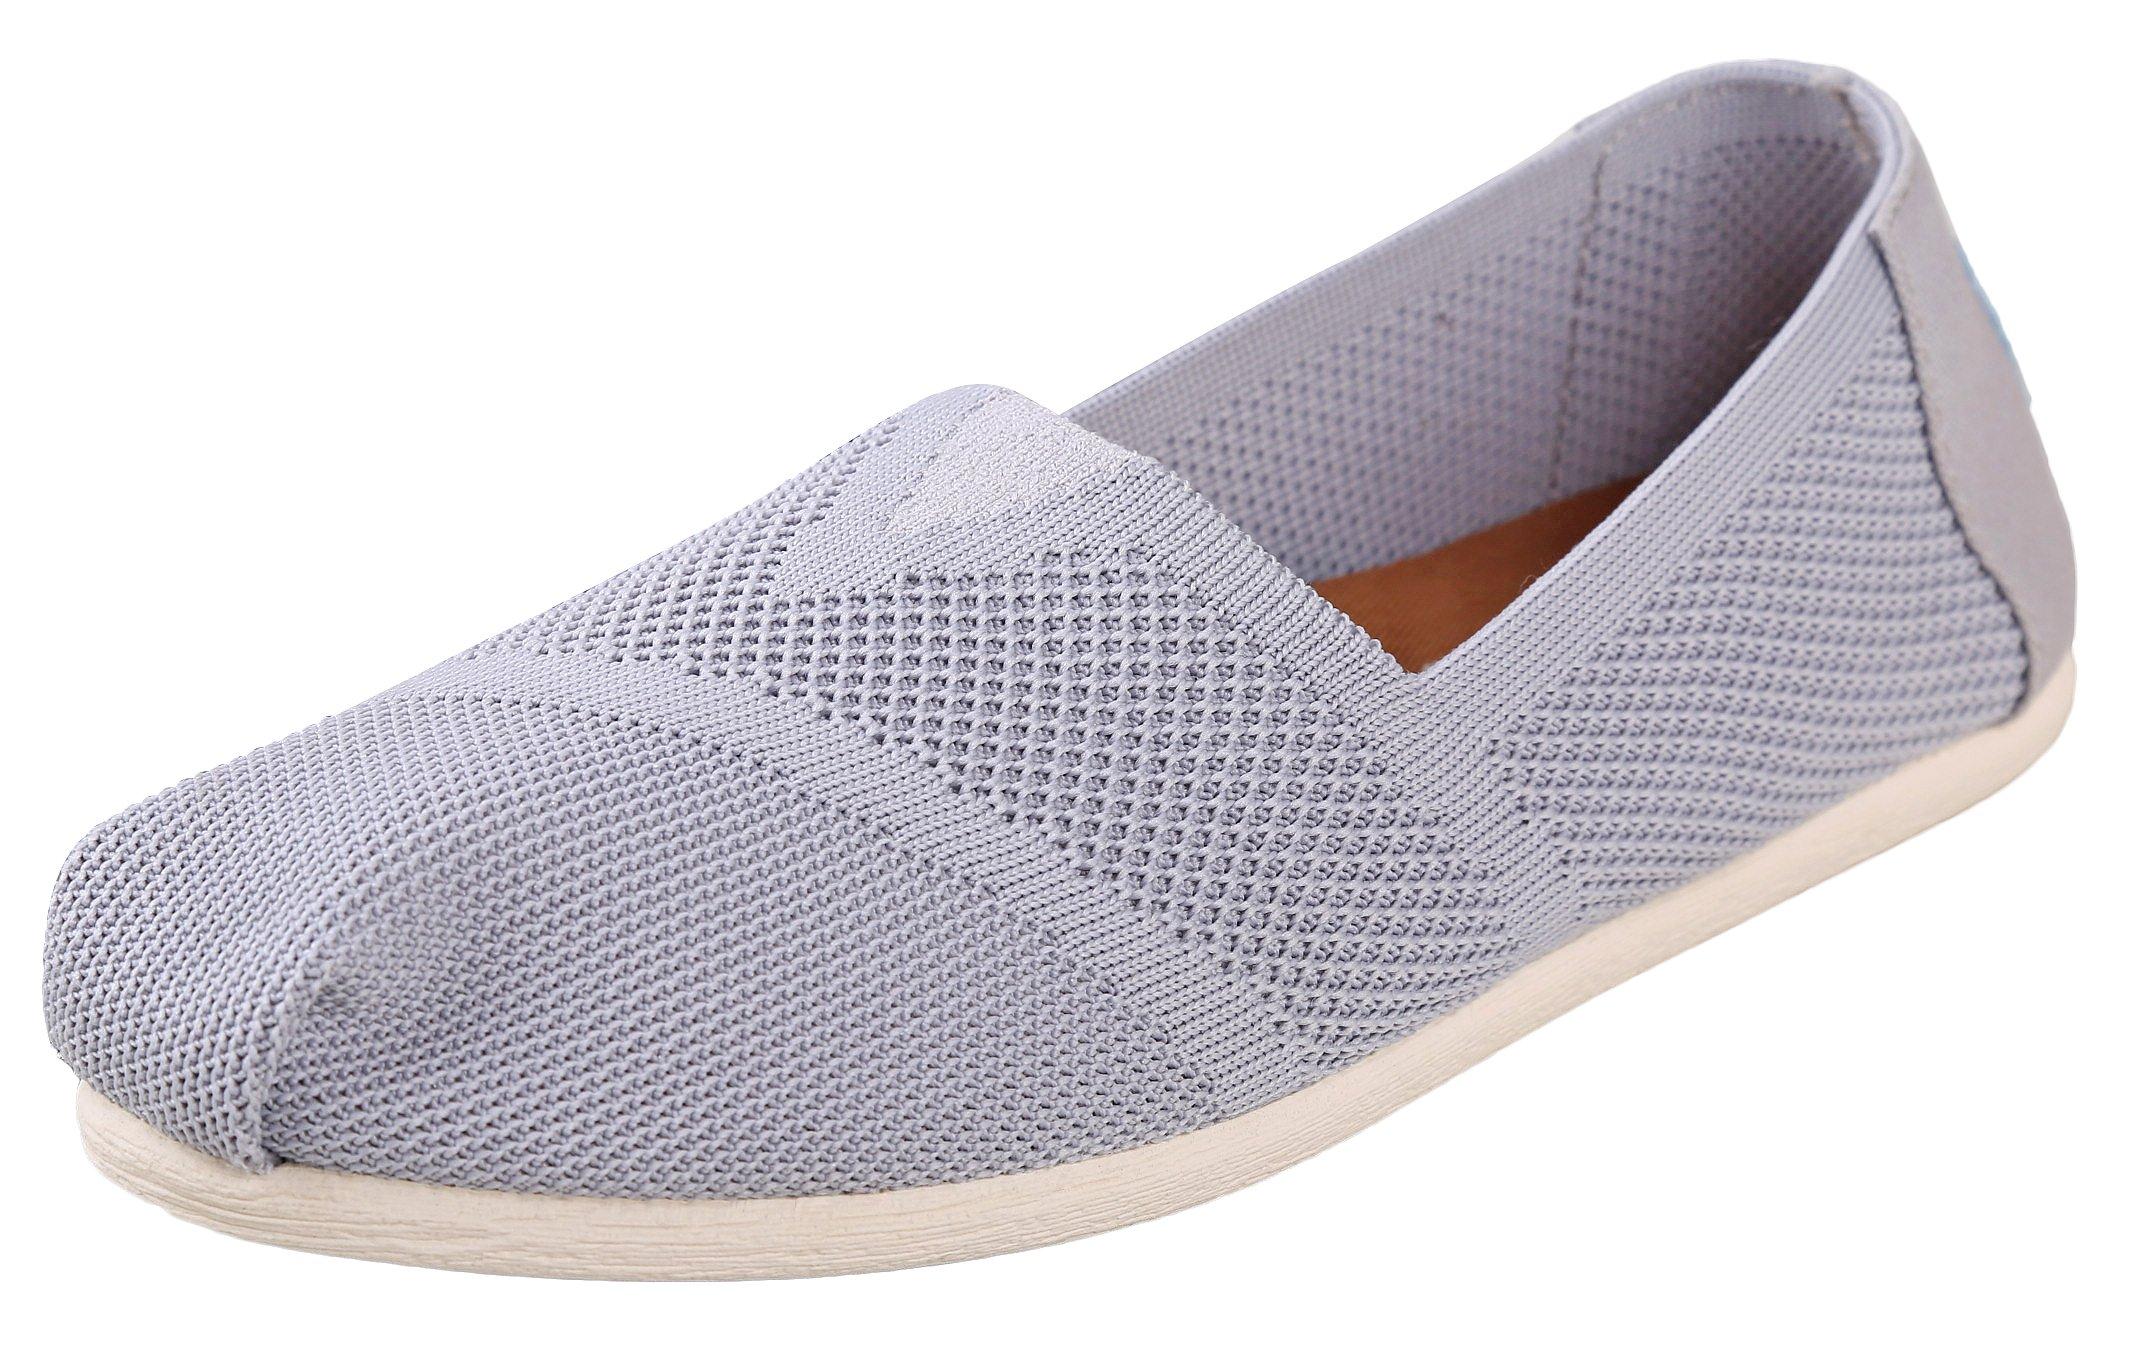 TOMS Women's Classic Flat Slip-On Drizzle Grey Custom Knit 8.5